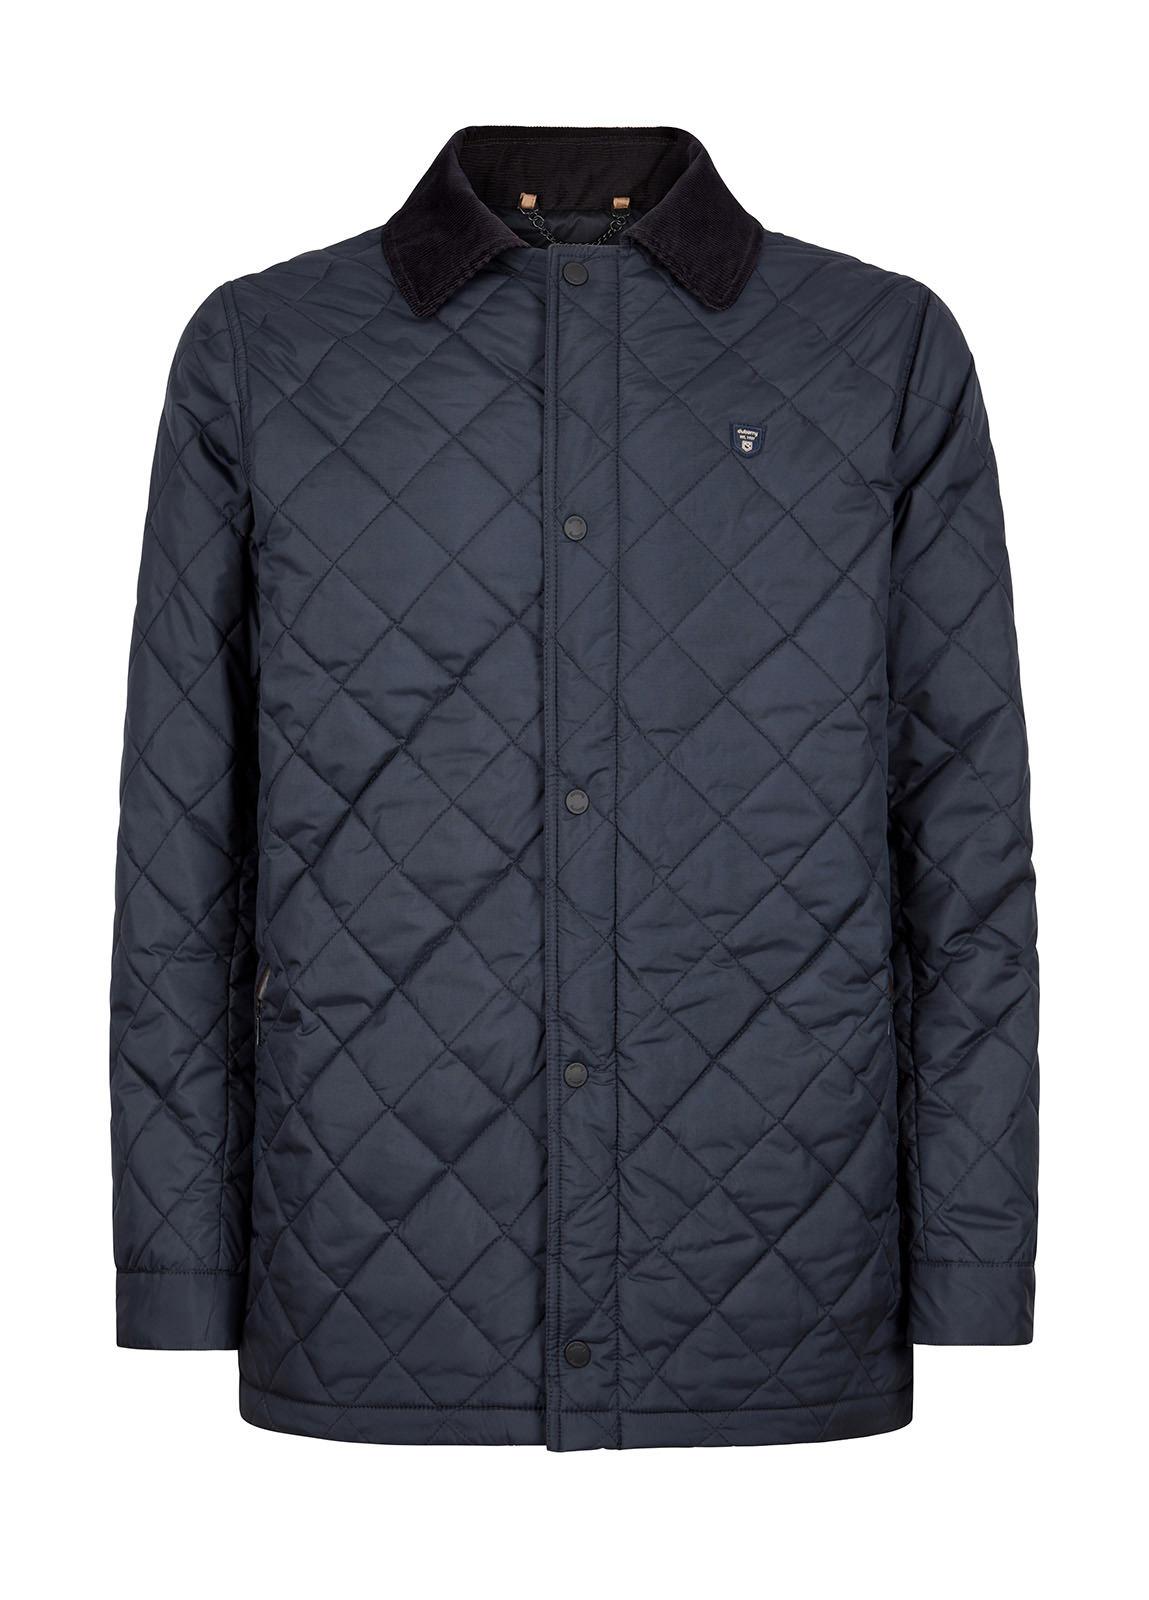 Clonard Men's Jacket - Navy